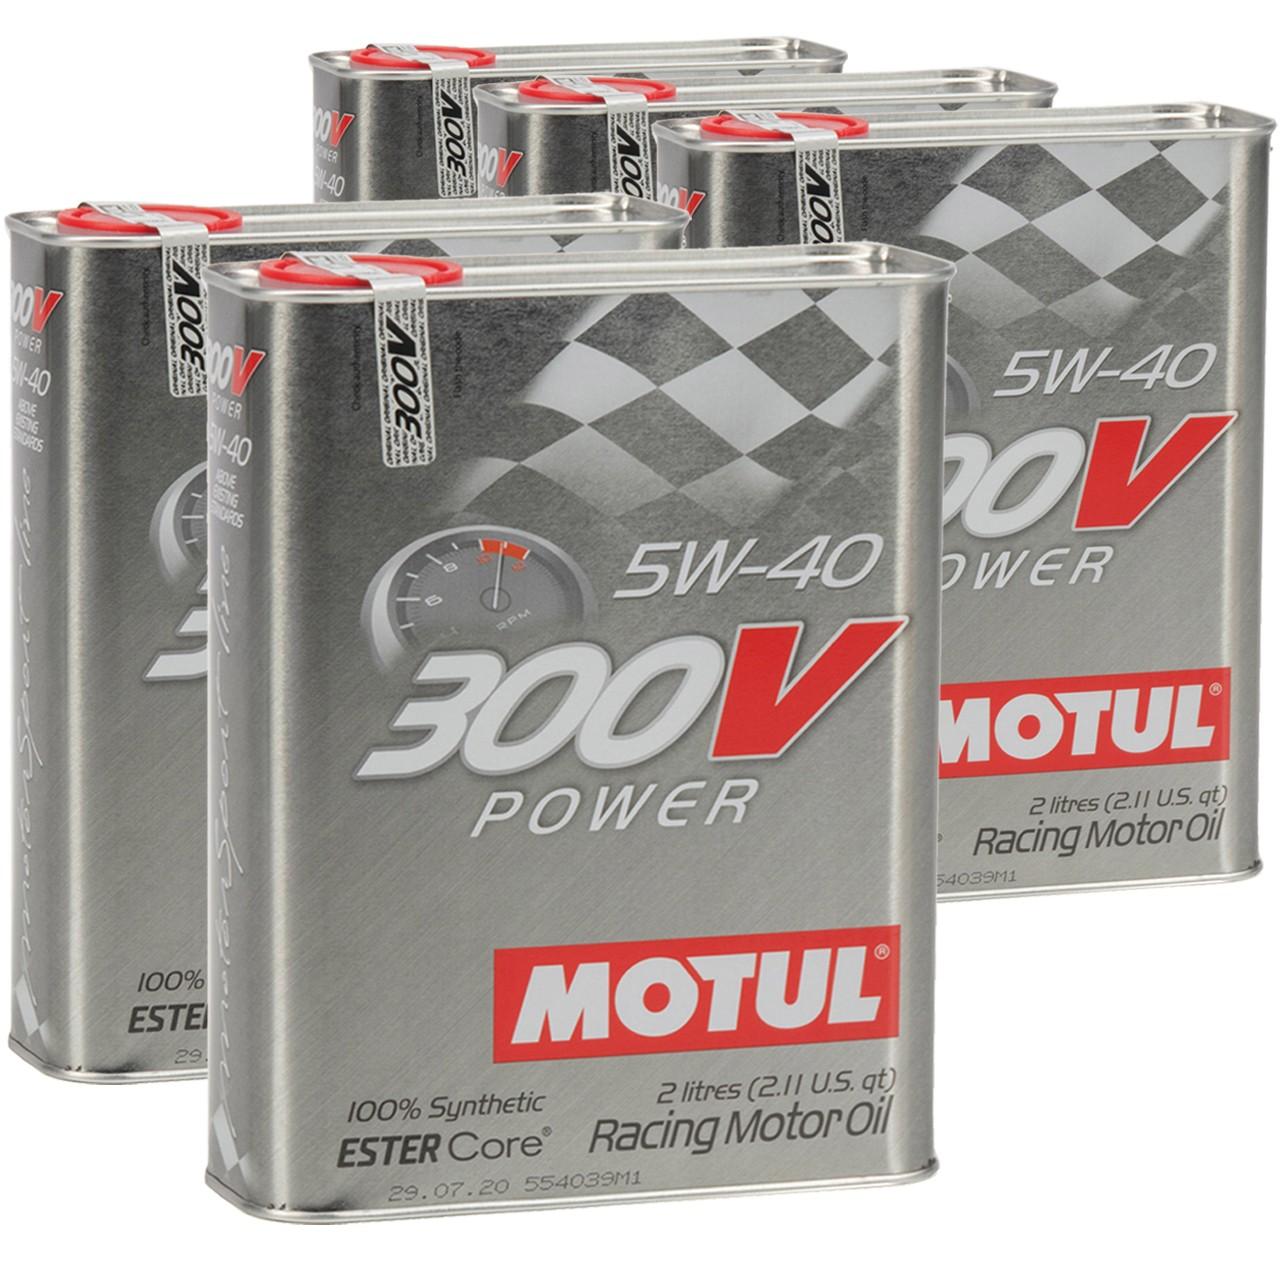 MOTUL 300V POWER RACING Motoröl Öl 5W40 100% Synthetic Ester Core - 10L 10 Liter